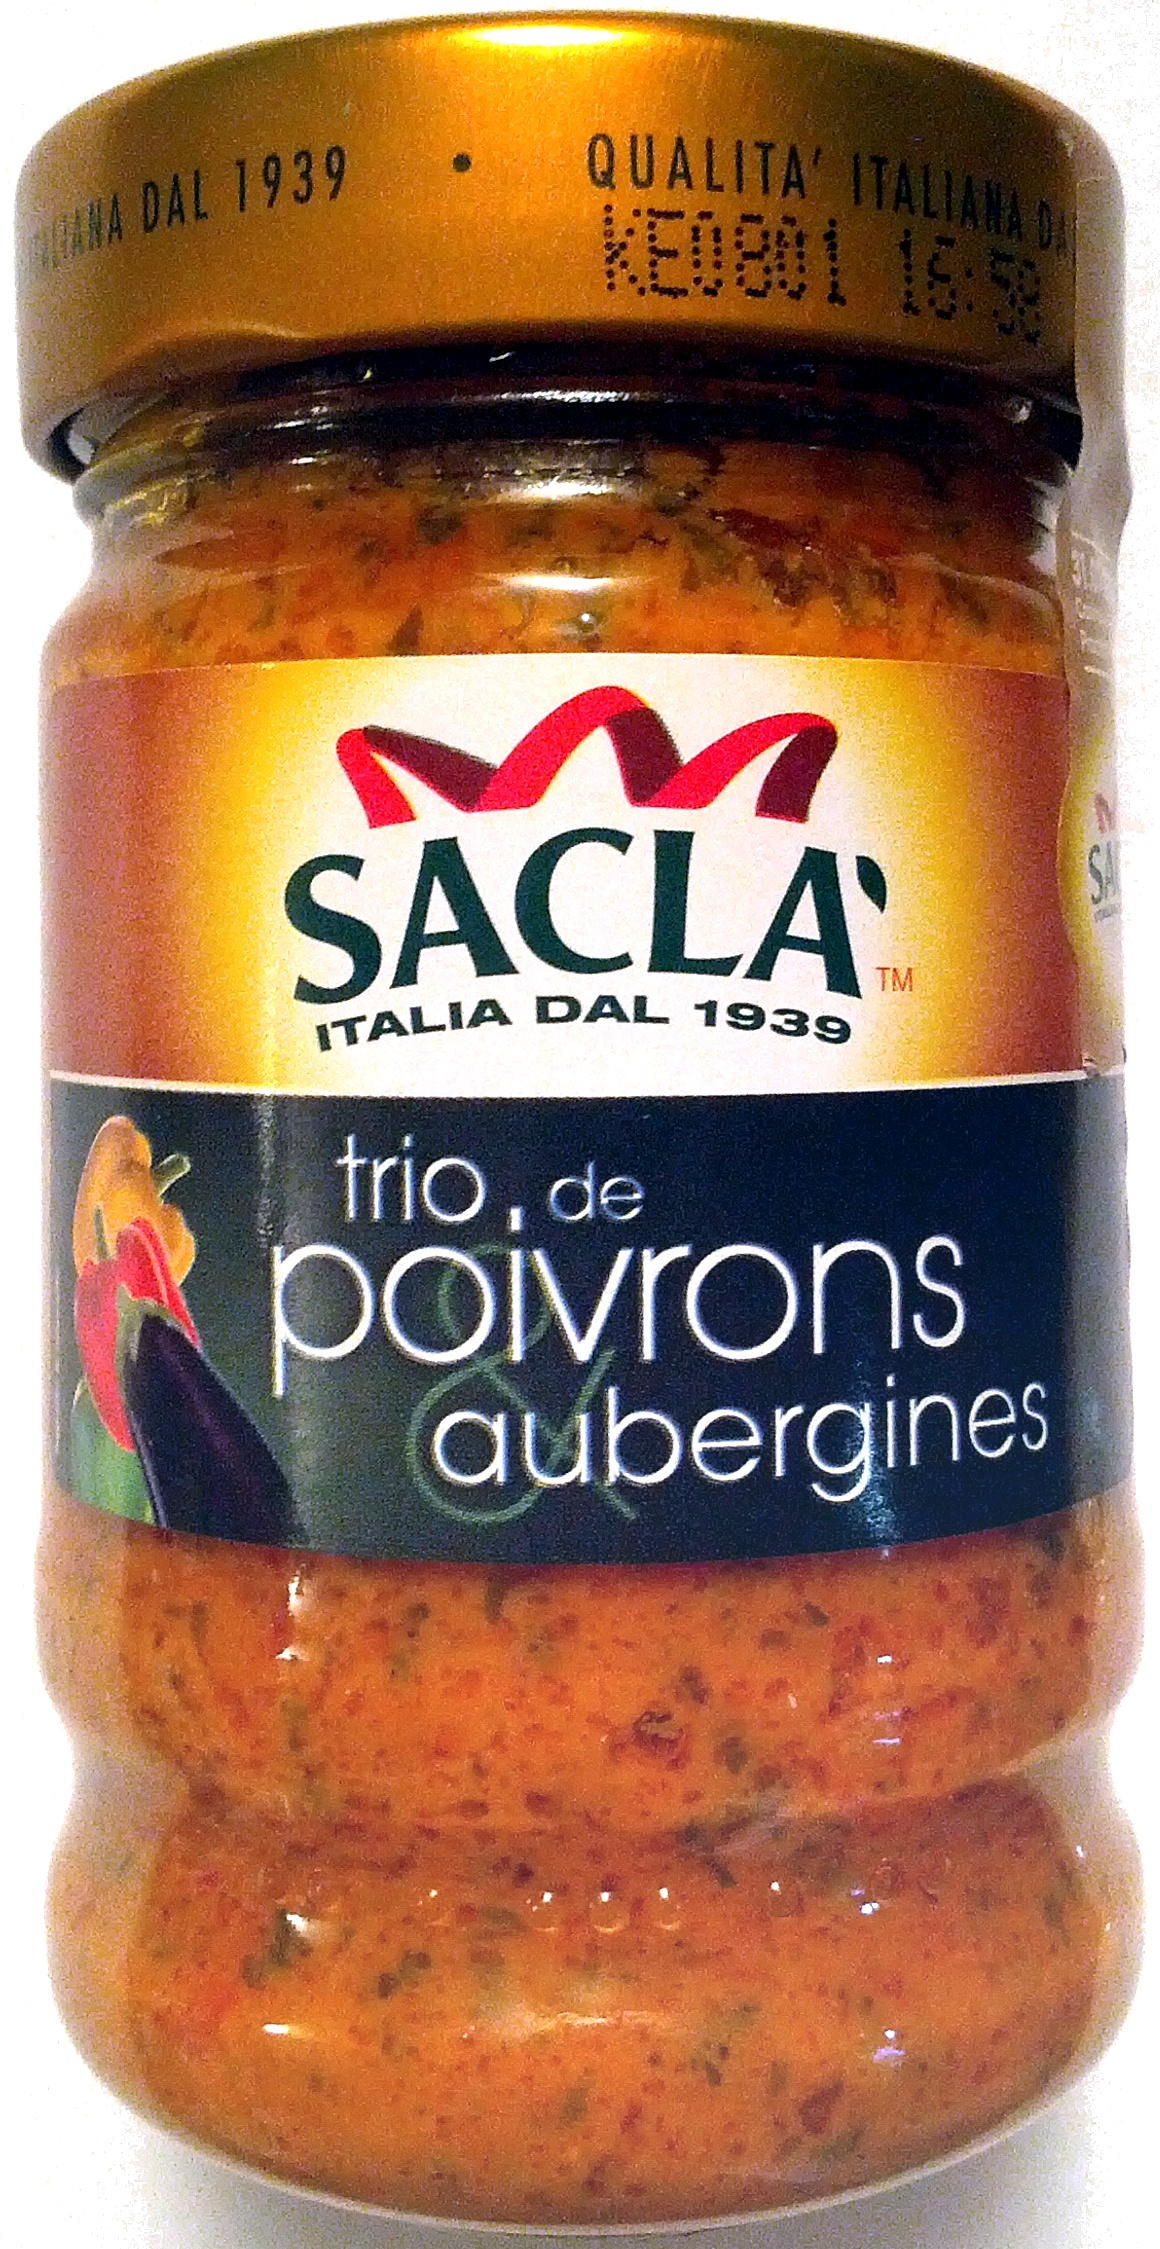 Trio de poivrons aubergines (Sauce) - Product